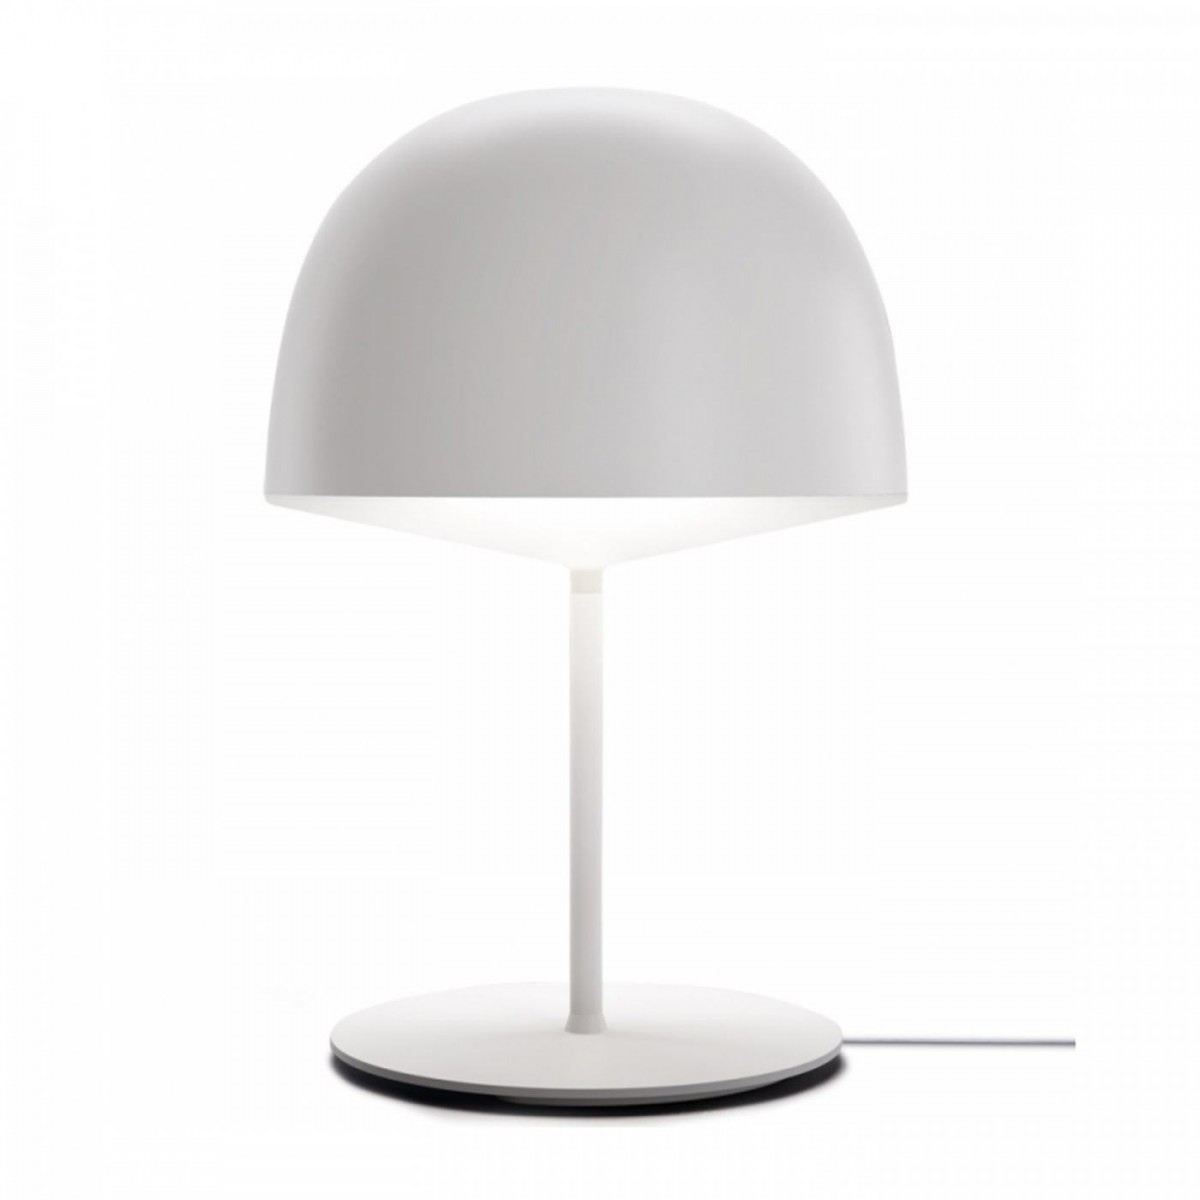 FontanaArte Cheshire White Table Lamp Outlet | Desout.com